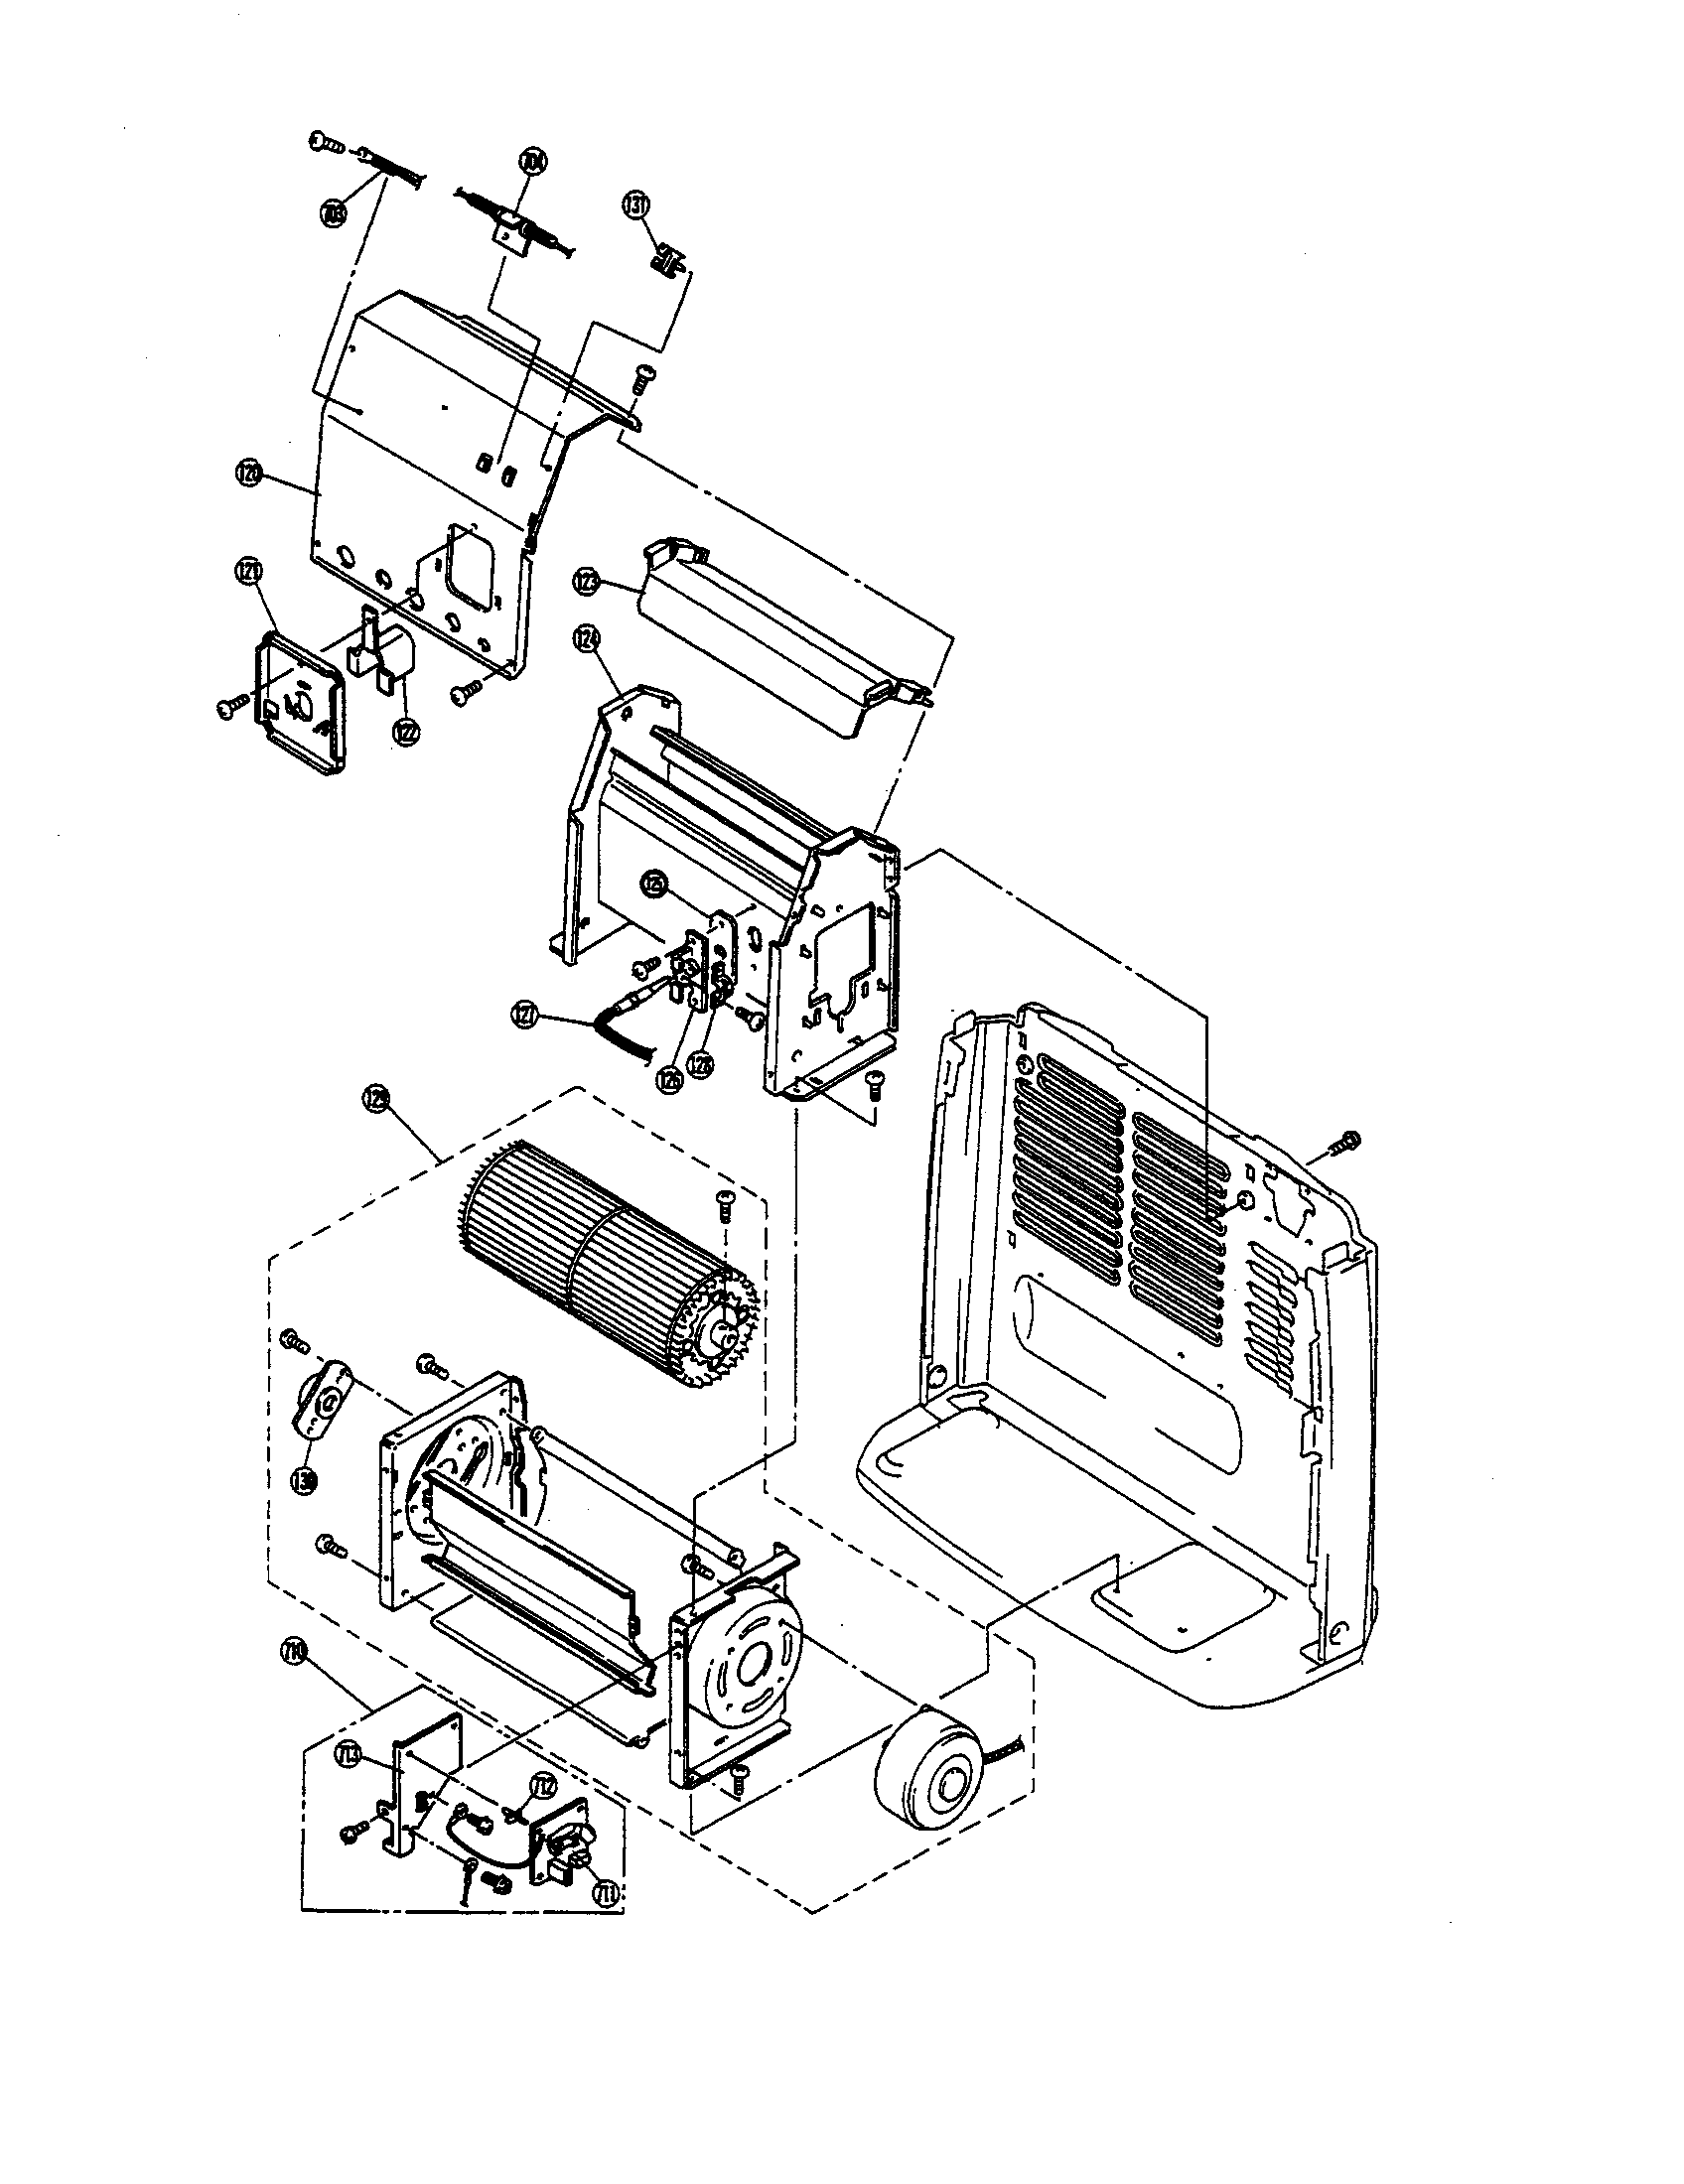 geyser isolator wiring diagram steam locomotive parts direct vent honda motorcycle repair